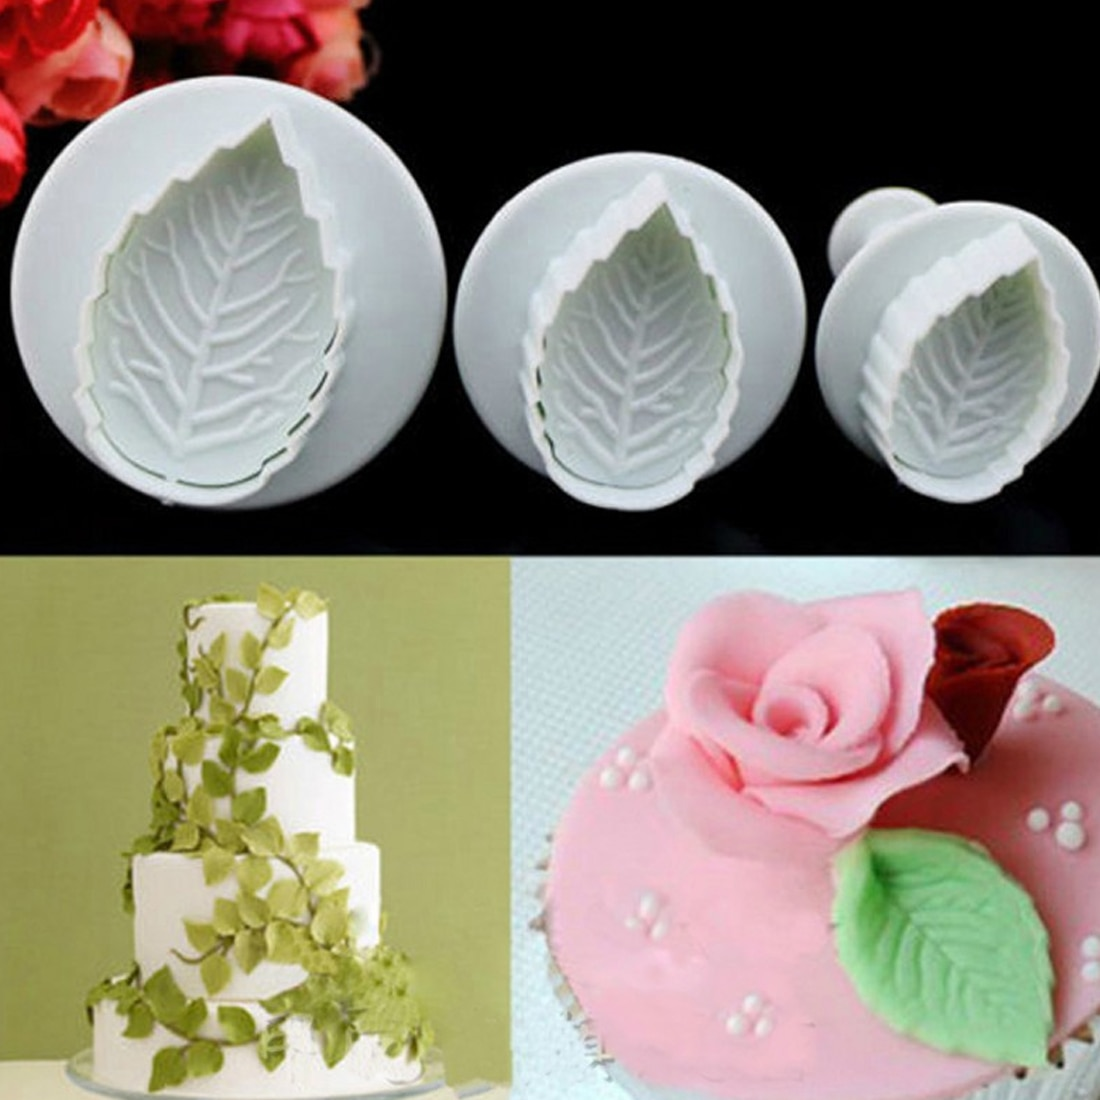 Good sale 3 Pcs Cake Rose Leaf Plunger Fondant Decorating Sugar Craft Mold Cutter Tools